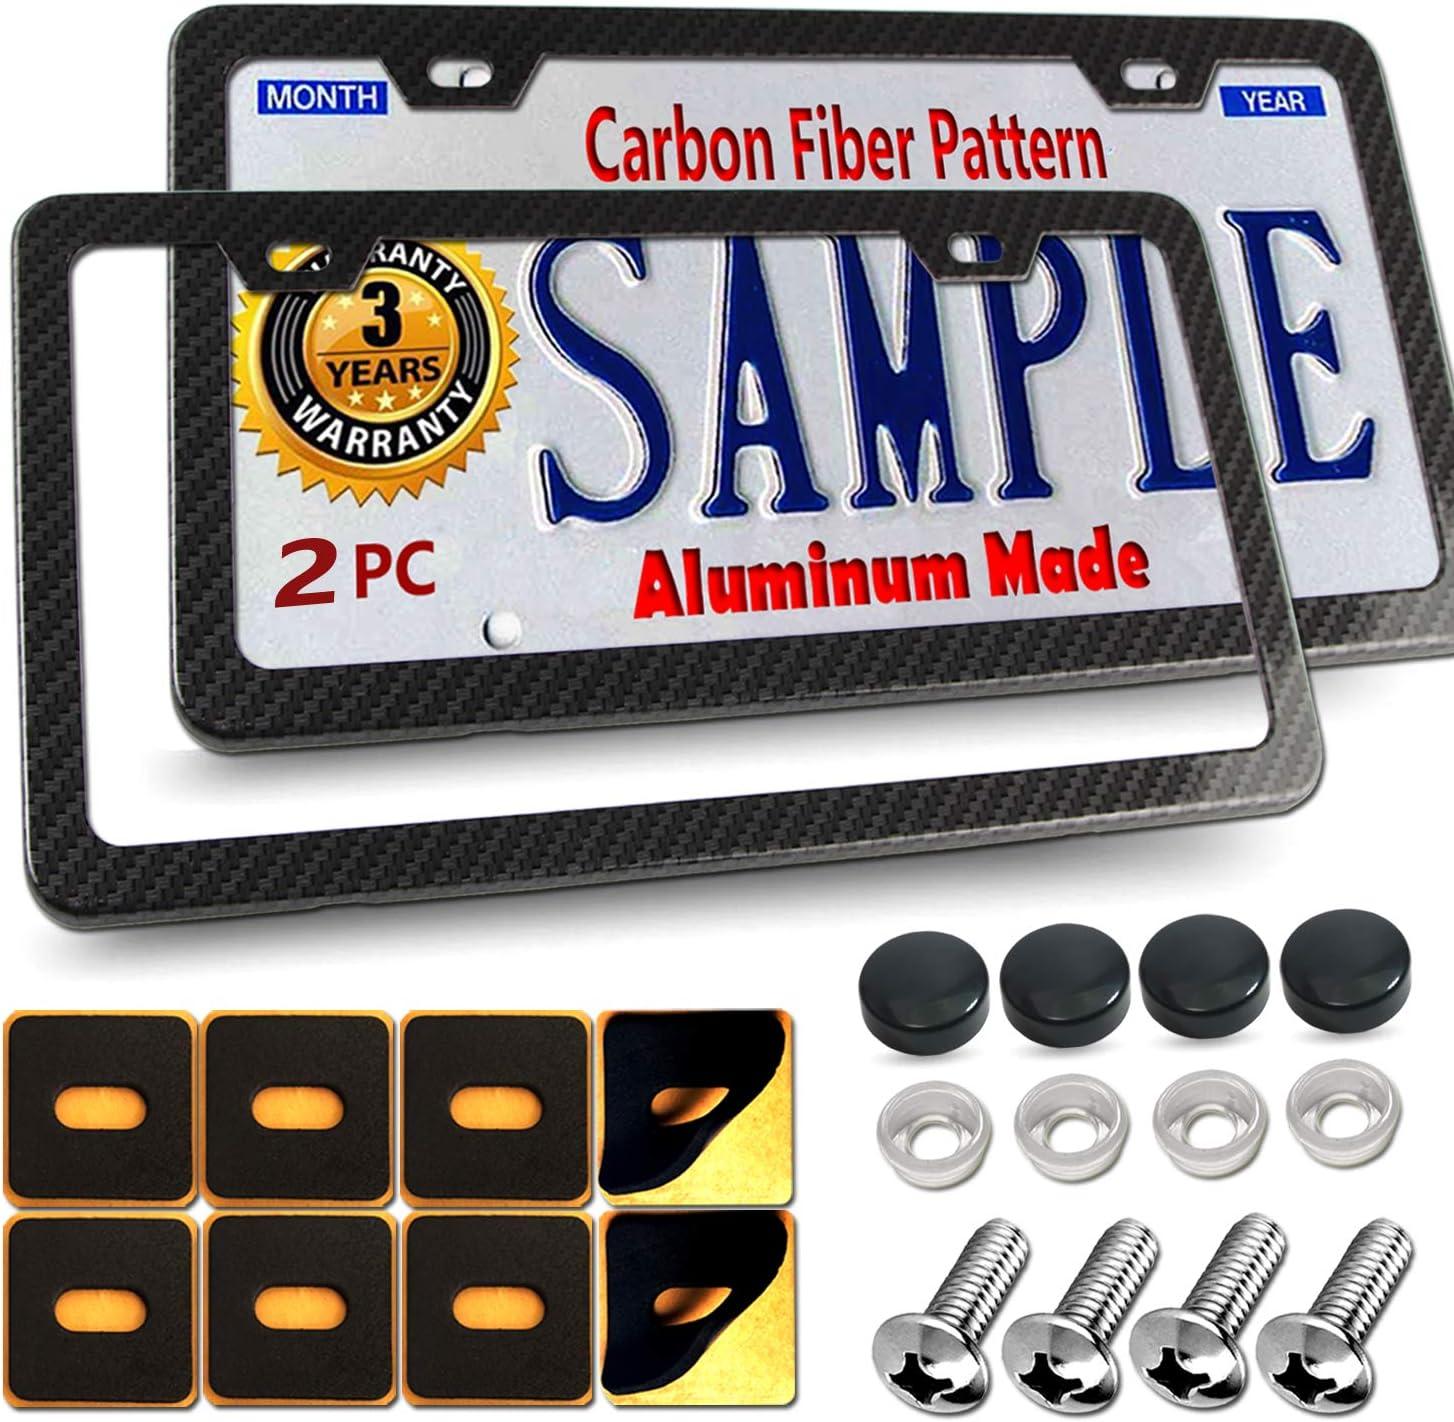 BGGTMO Carbon Fiber License Plate Frames Slim Size Metal Frame with Screw Covers Large Size Shock Pad Bonus Car Non-Slip Mat (2 holes-2Pcs)